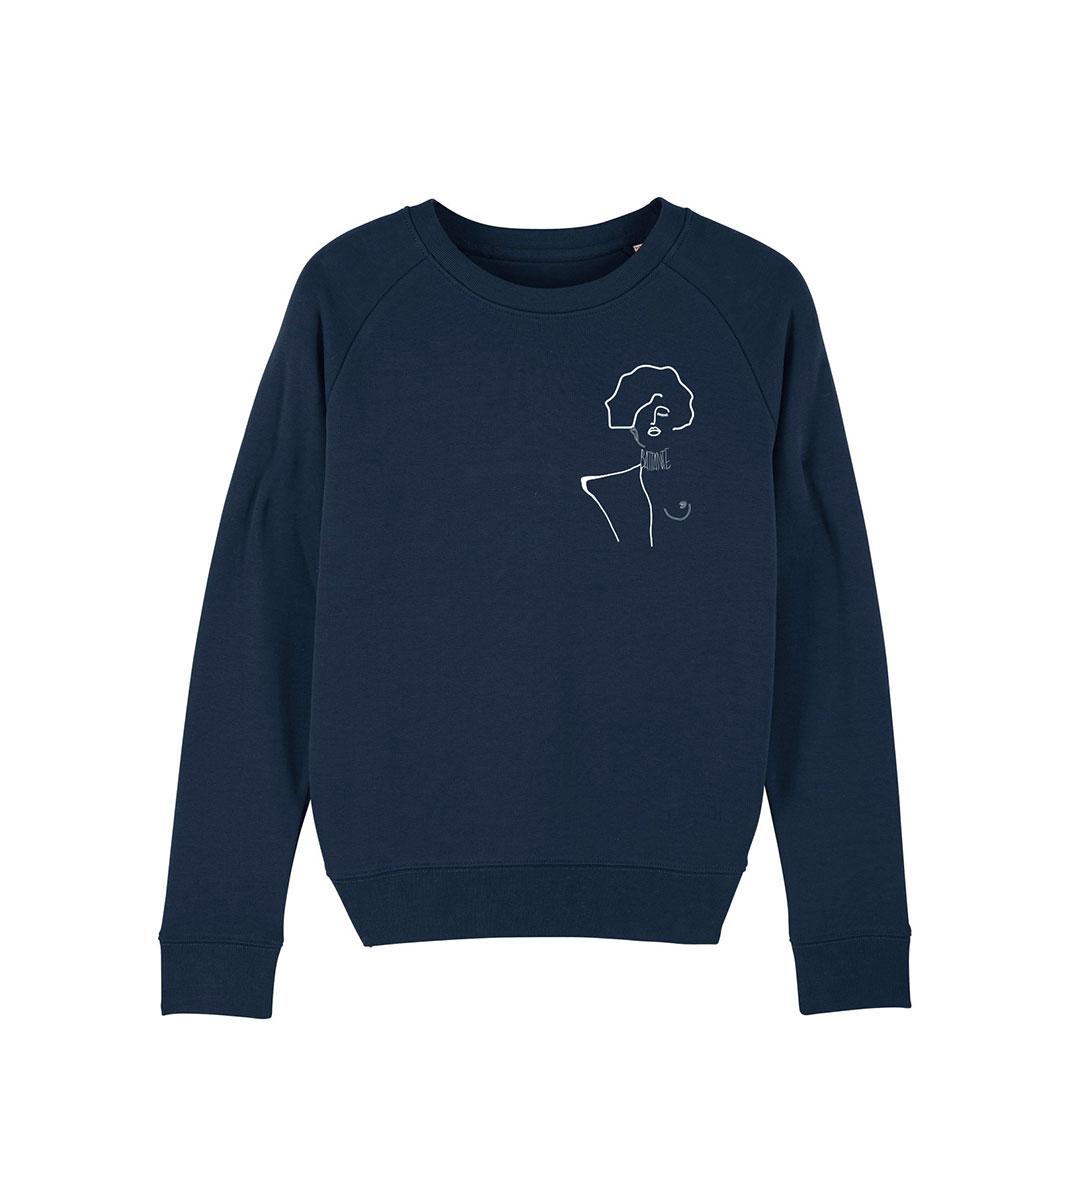 mockup sweatshirt bleu de la marque leonor roversi, le visuel représente un tableau de gustav Klimt